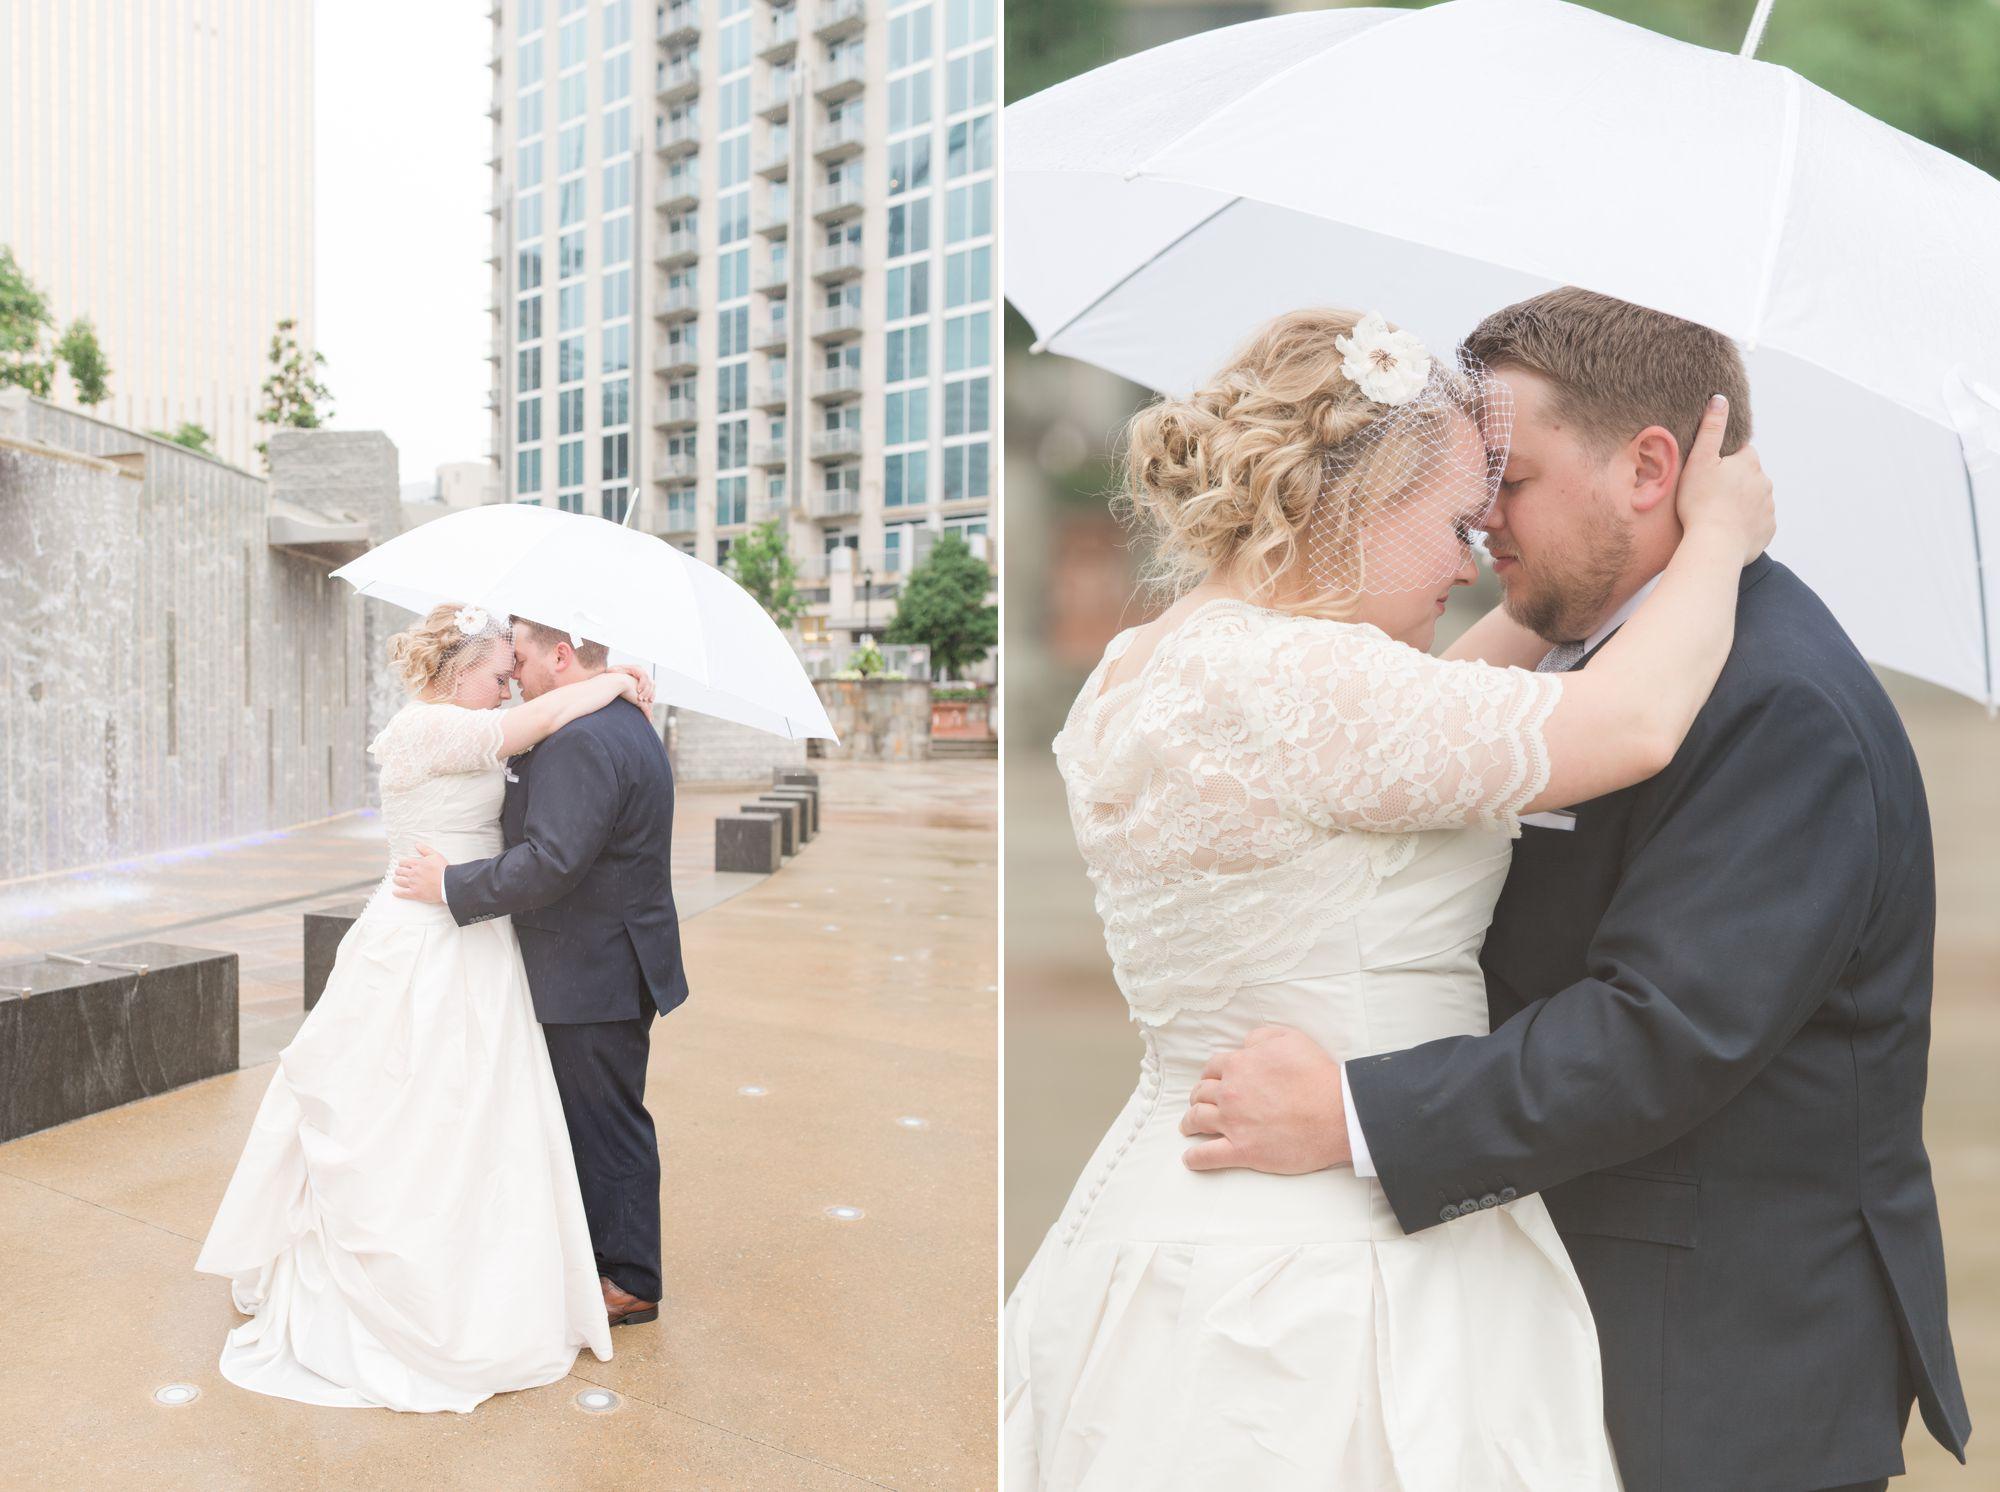 uptown-charlotte-warhouse-wedding 31